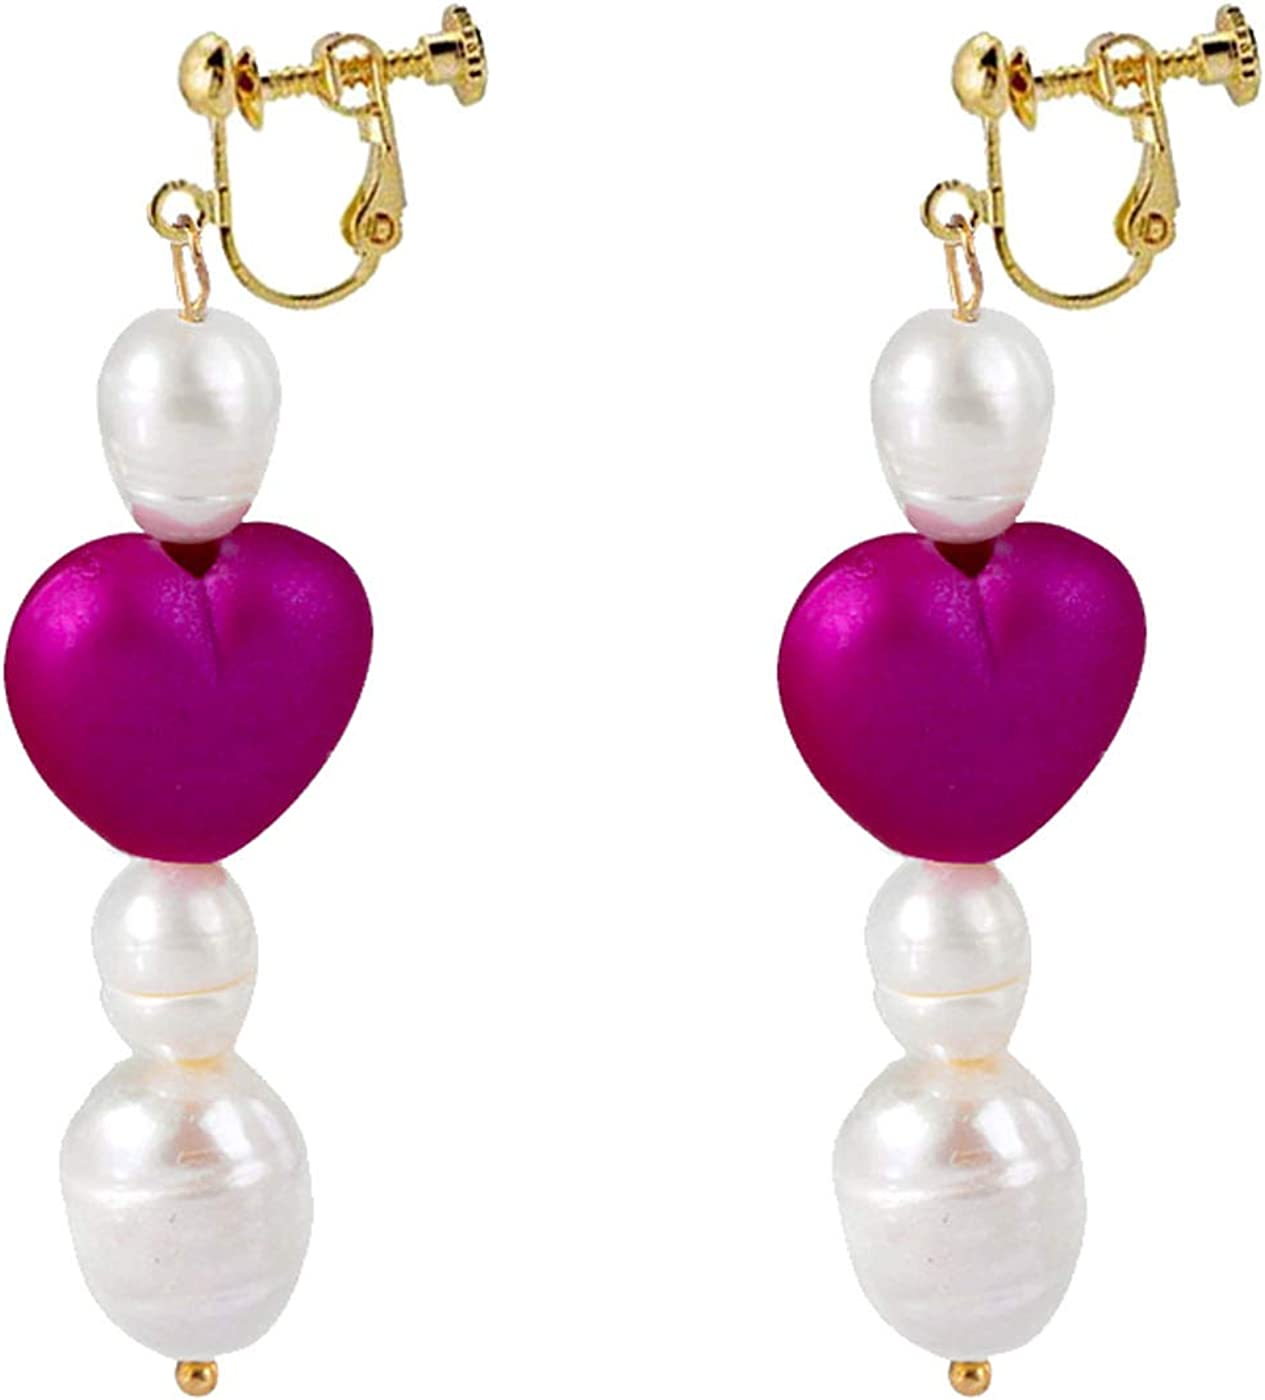 Retro Clip on Earrings for Women Girl Simulated Pearl Tassel Love Heart Earrings Tassel Sweet Non Pierced